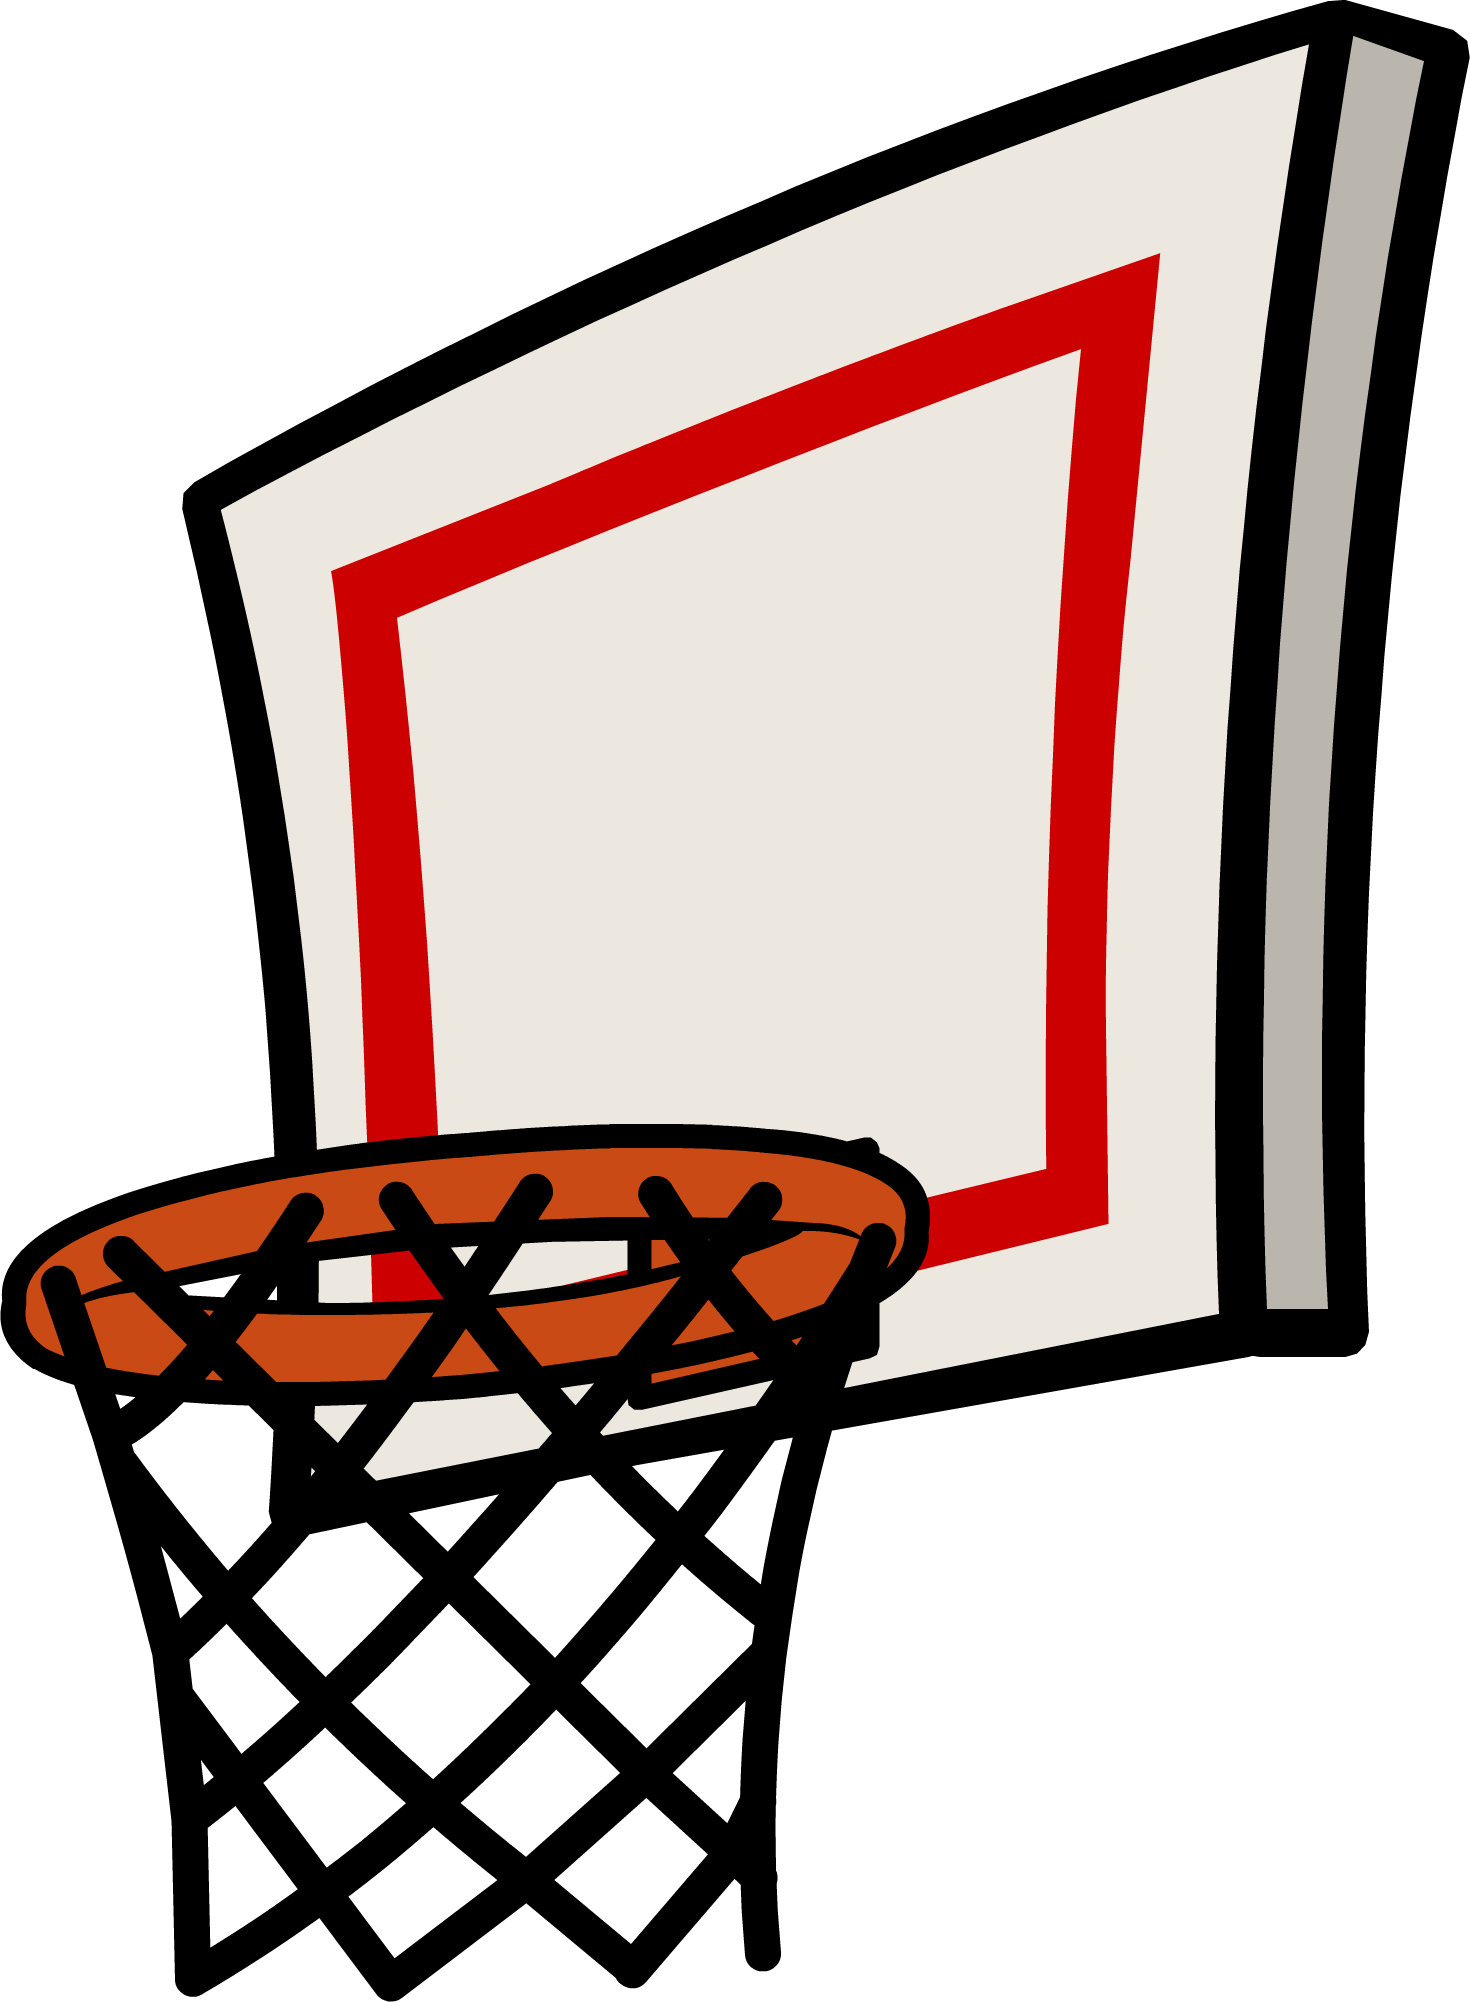 Basketball Net PNG - 74602